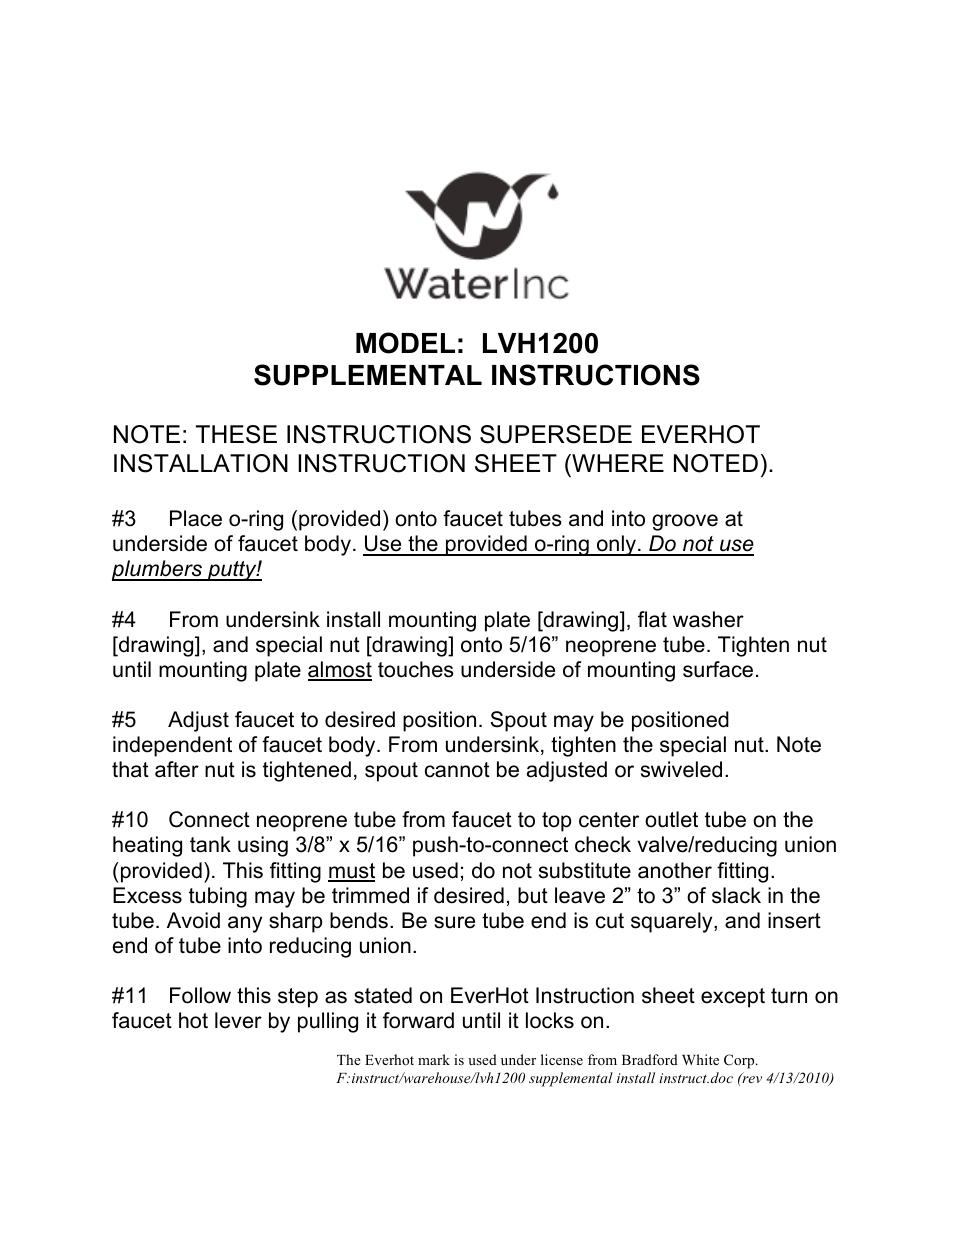 Water Inc LVH1200 User Manual | 1 page